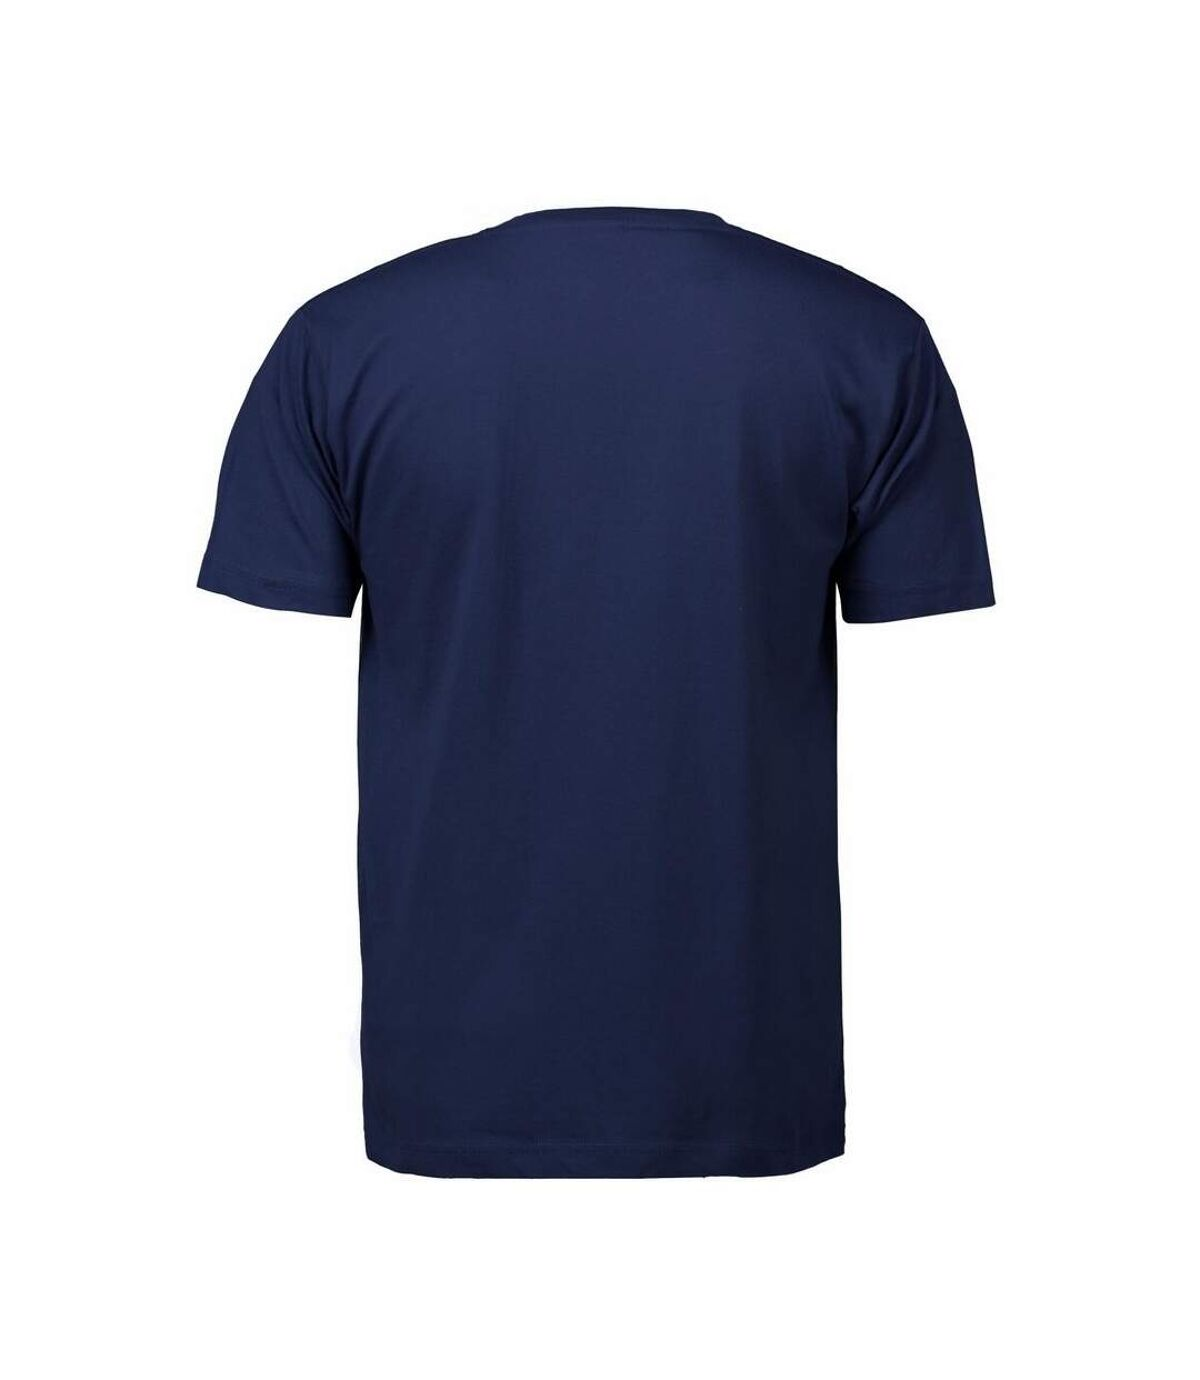 ID Mens T-Time Classic Regular Fitting Short Sleeve T-Shirt (Navy) - UTID268